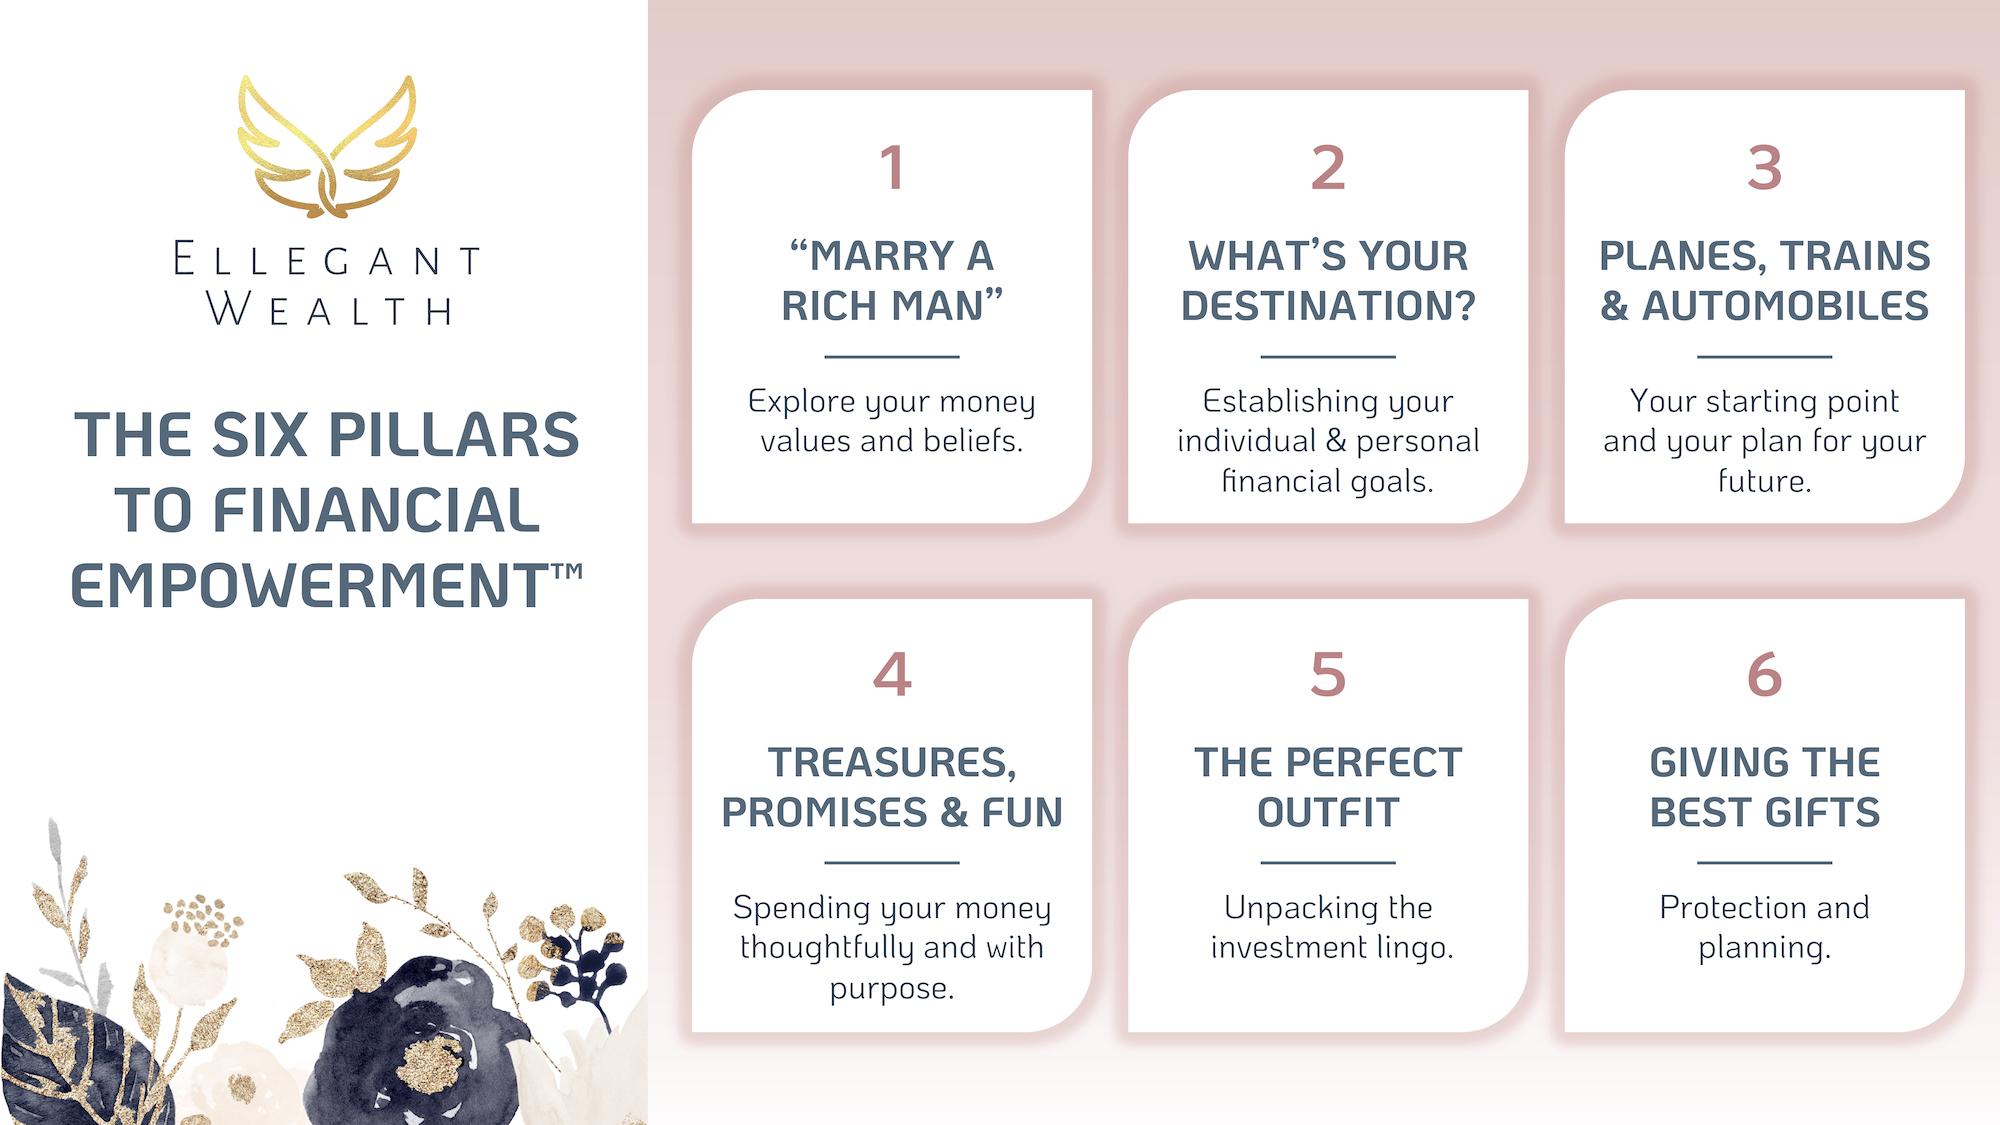 The Six Pillars To Financial Empowerment(TM)